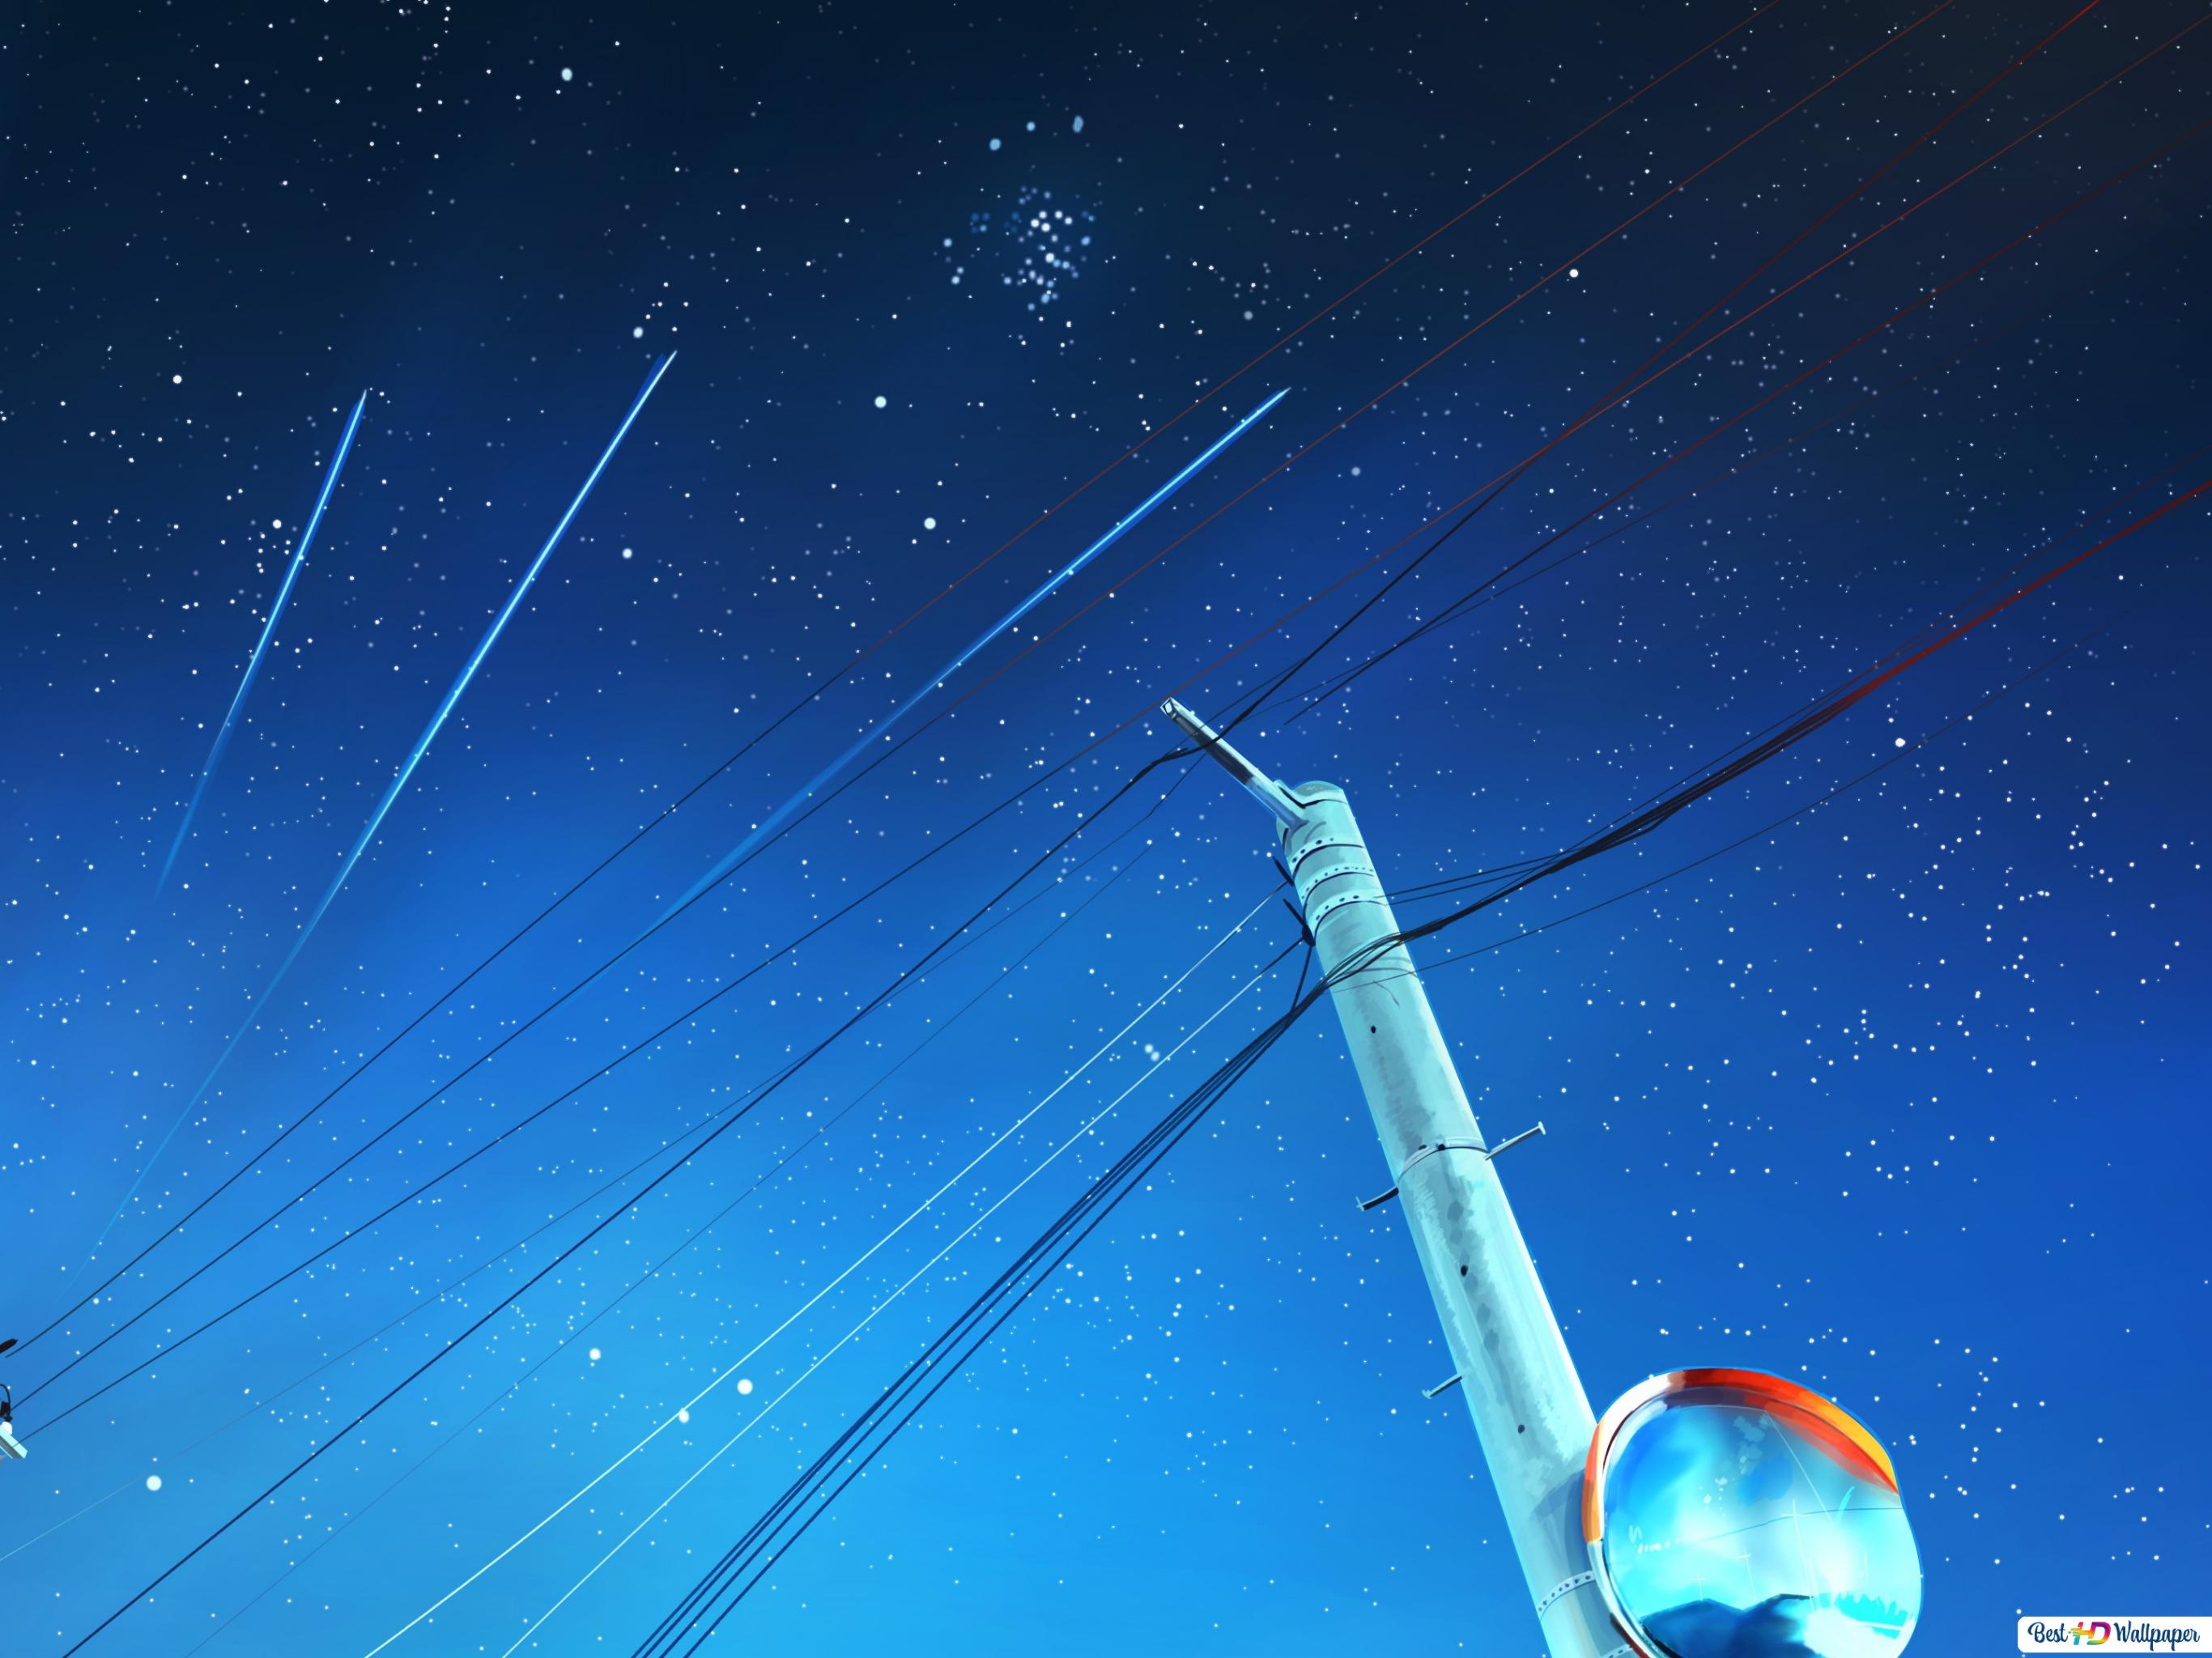 Night Shooting Stars Hd Wallpaper Download